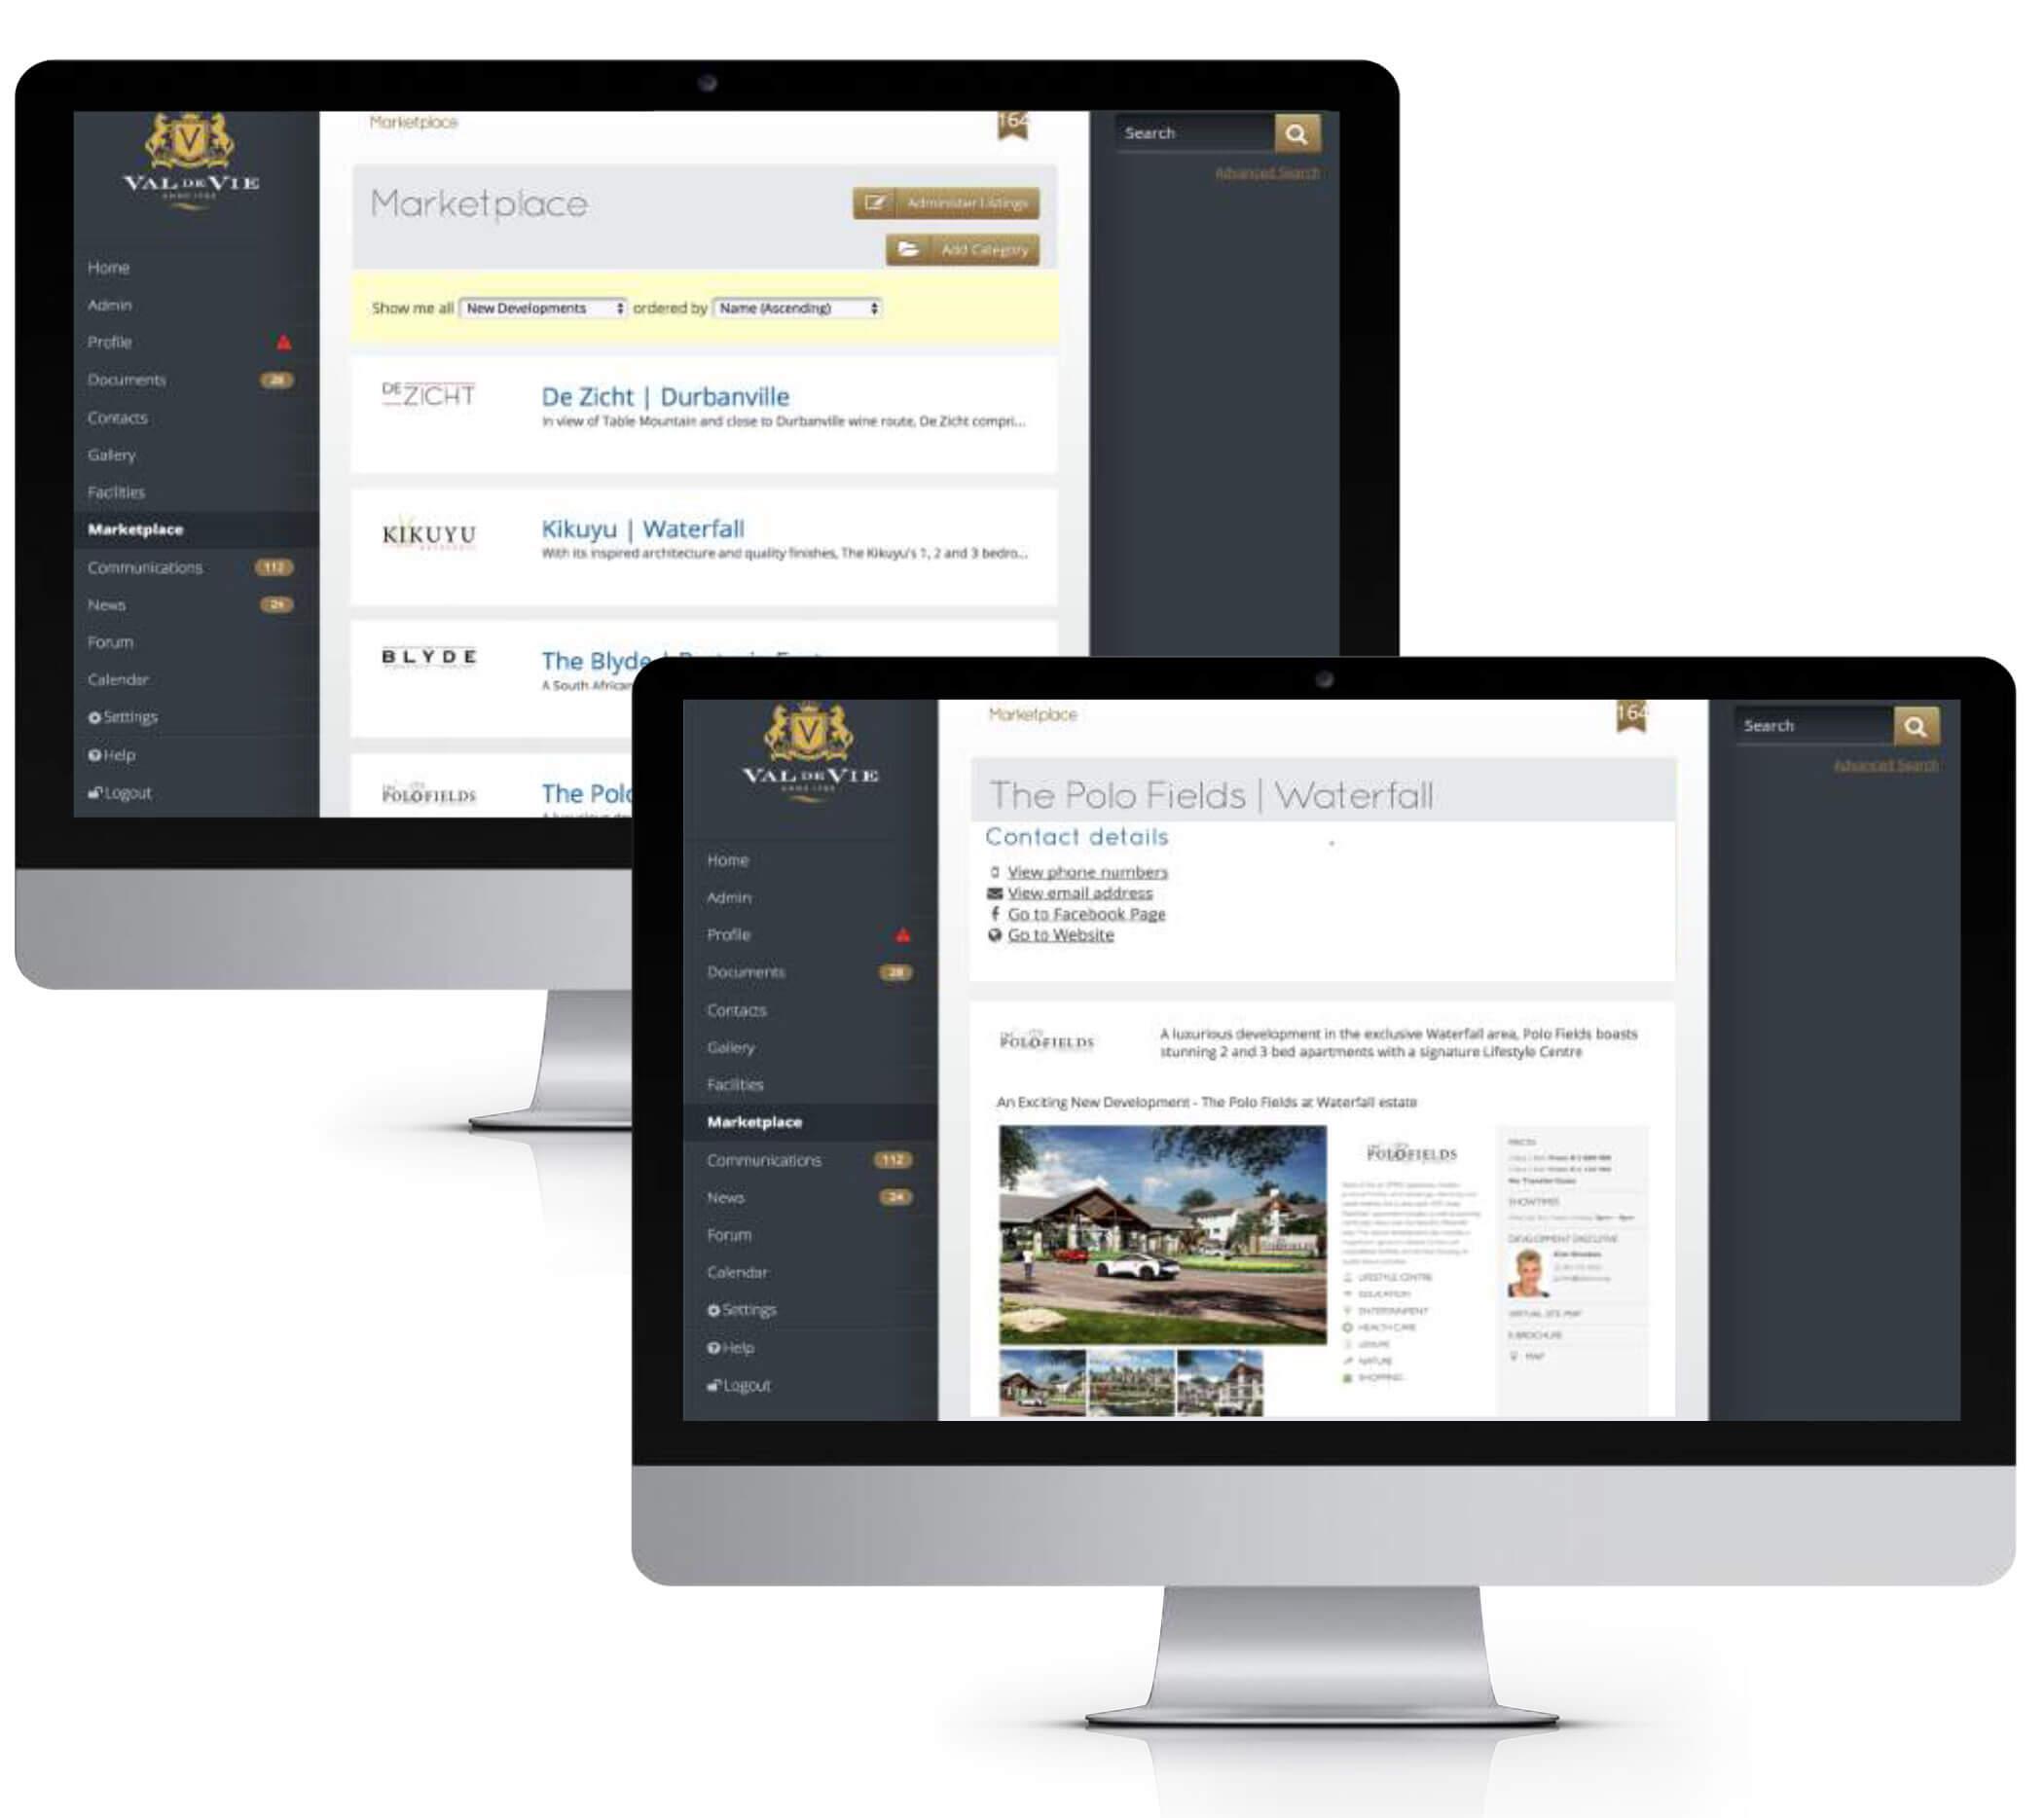 comm portal marketplace sub - REDi Communication